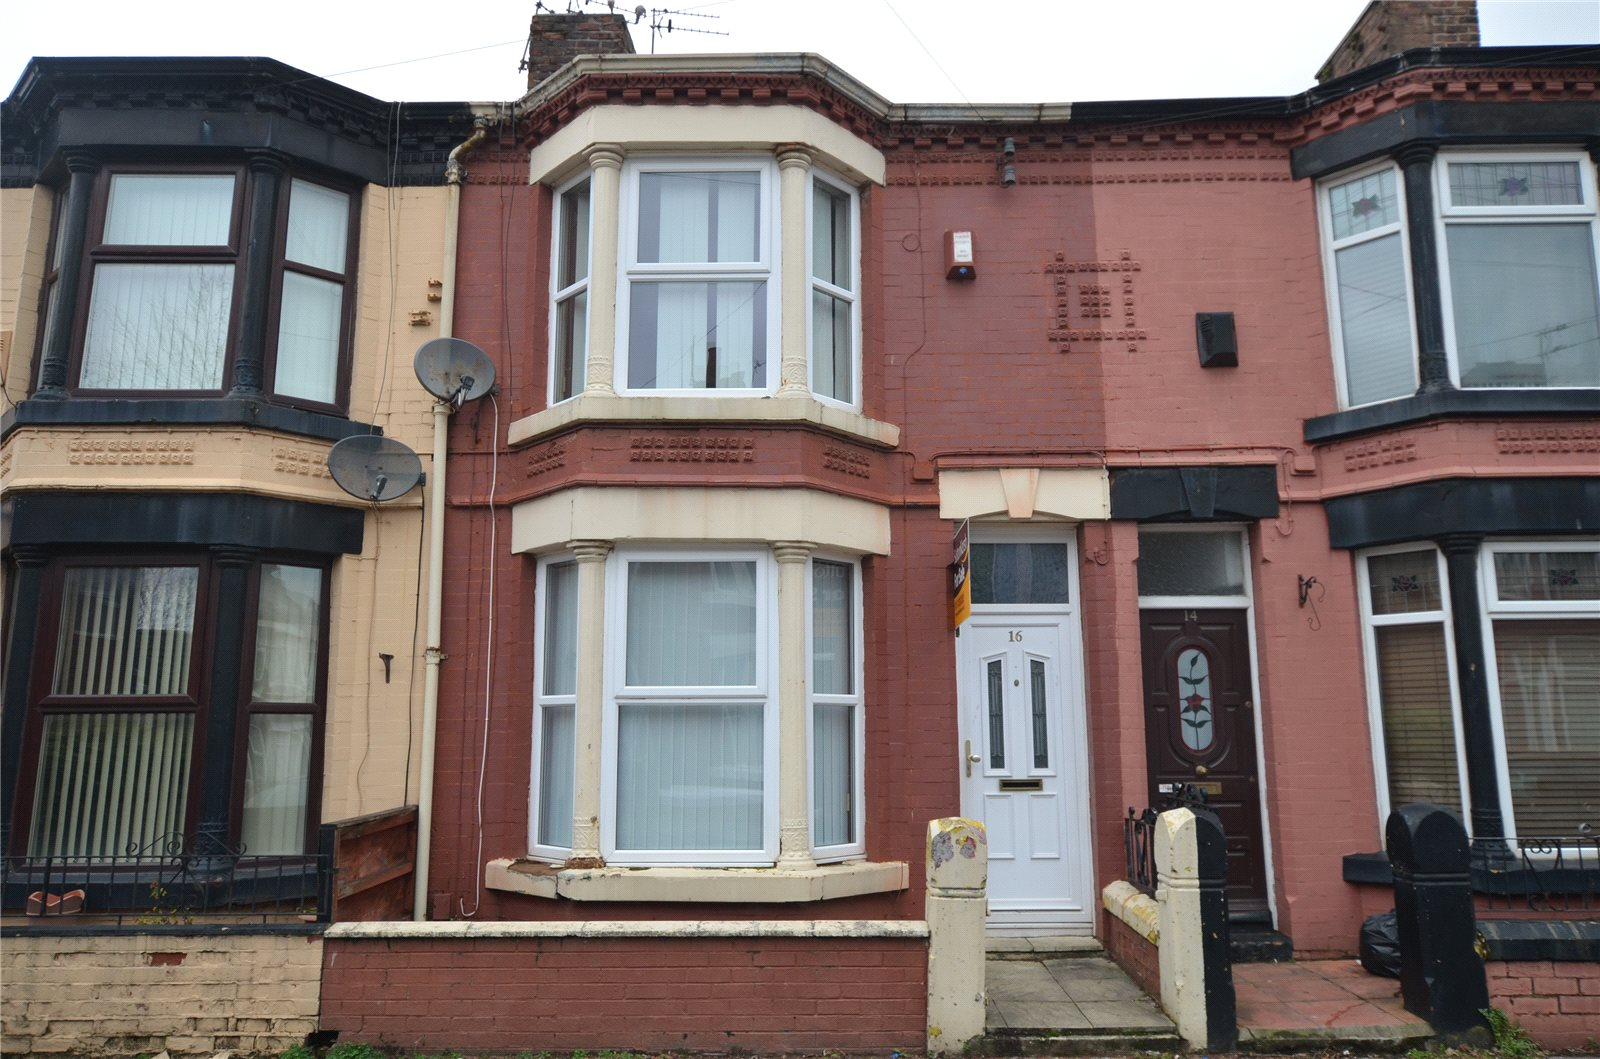 3 Bedrooms Terraced House for sale in Rutland Street, Bootle, Merseyside, L20